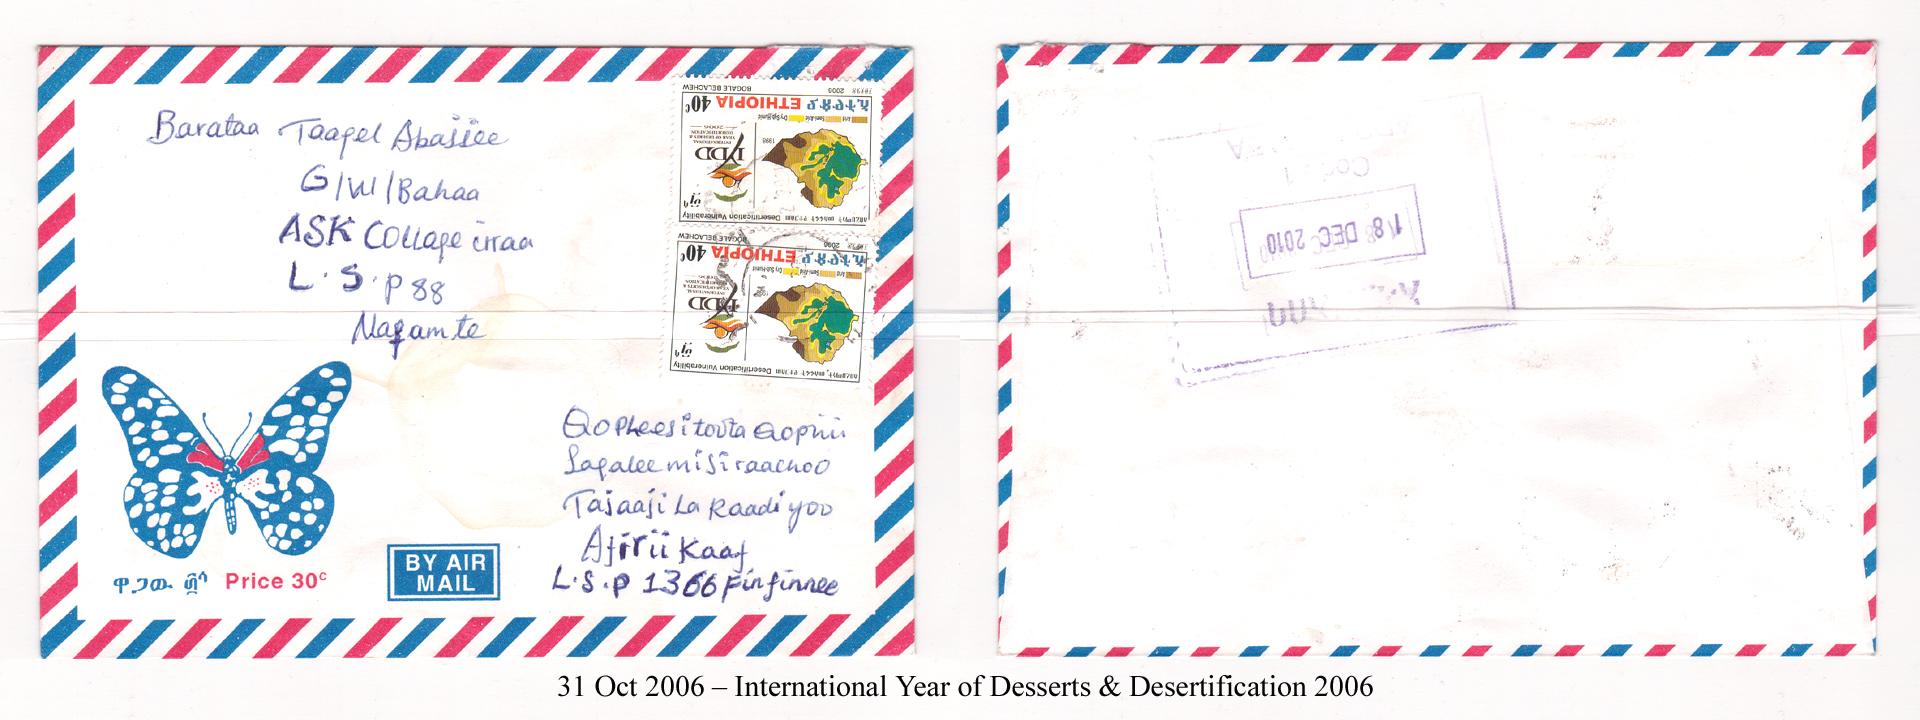 20061031 - International Year of Deserts & Desertification 2006